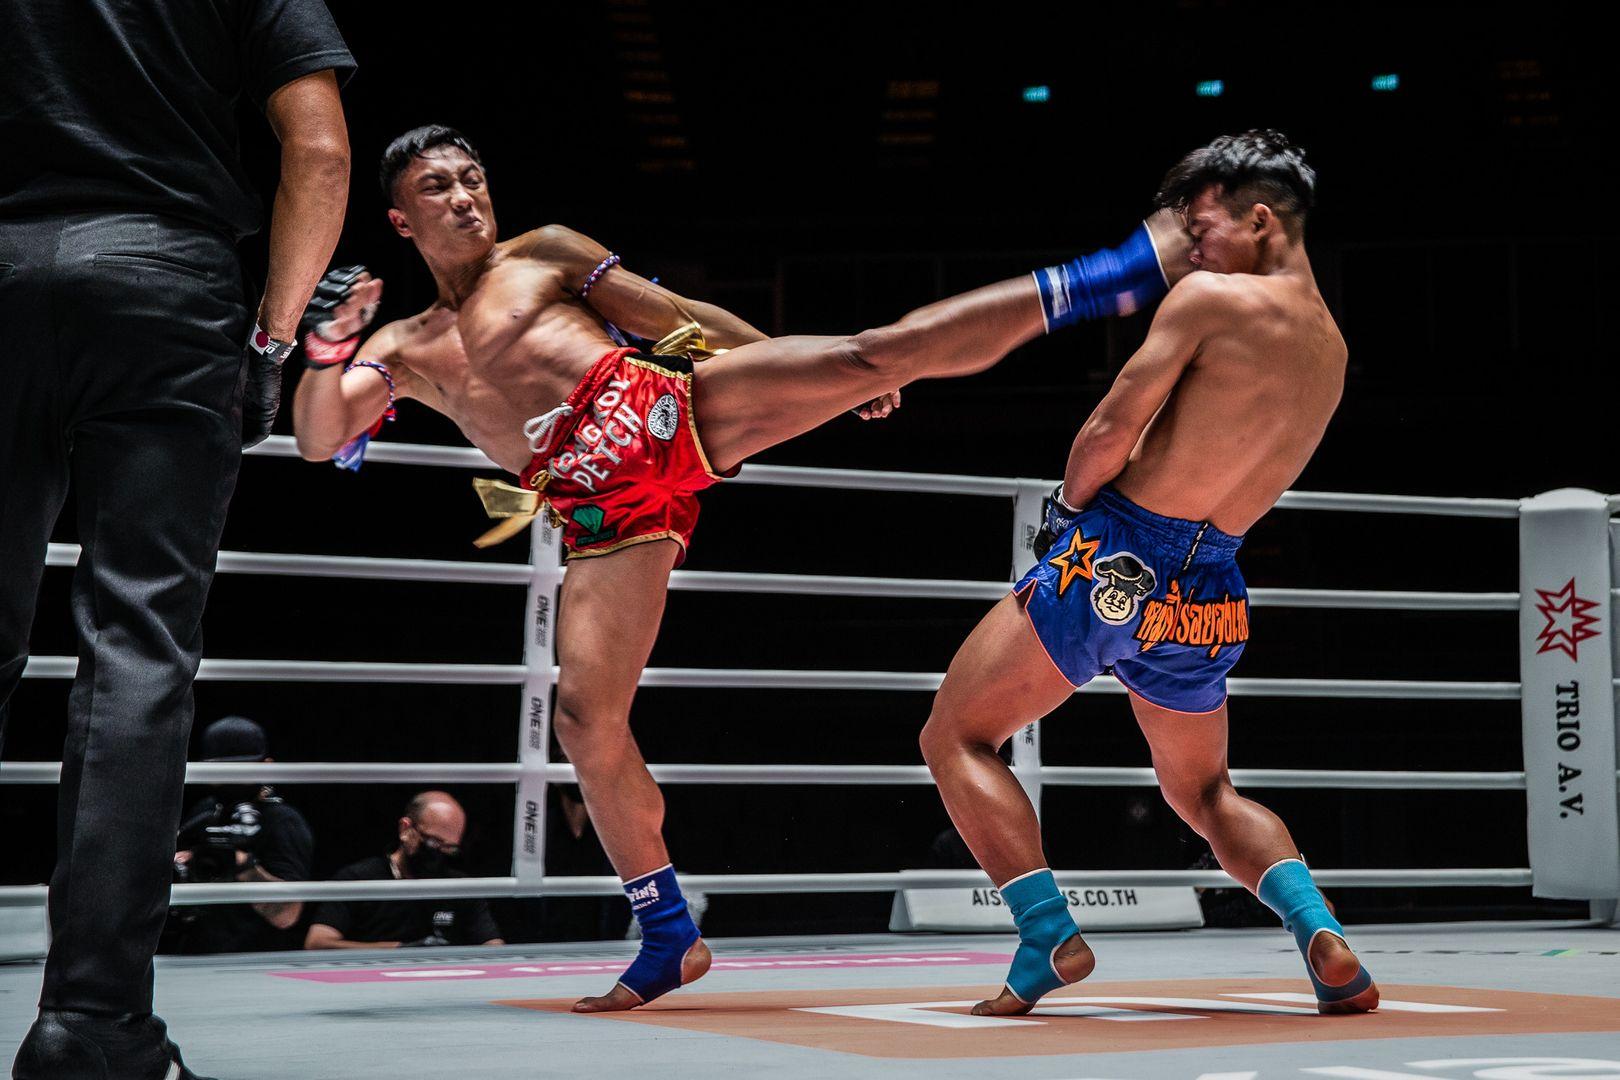 Muay Thai fighter Mongkolpetch Petchyindee Academy kicks Sok Thy in the head